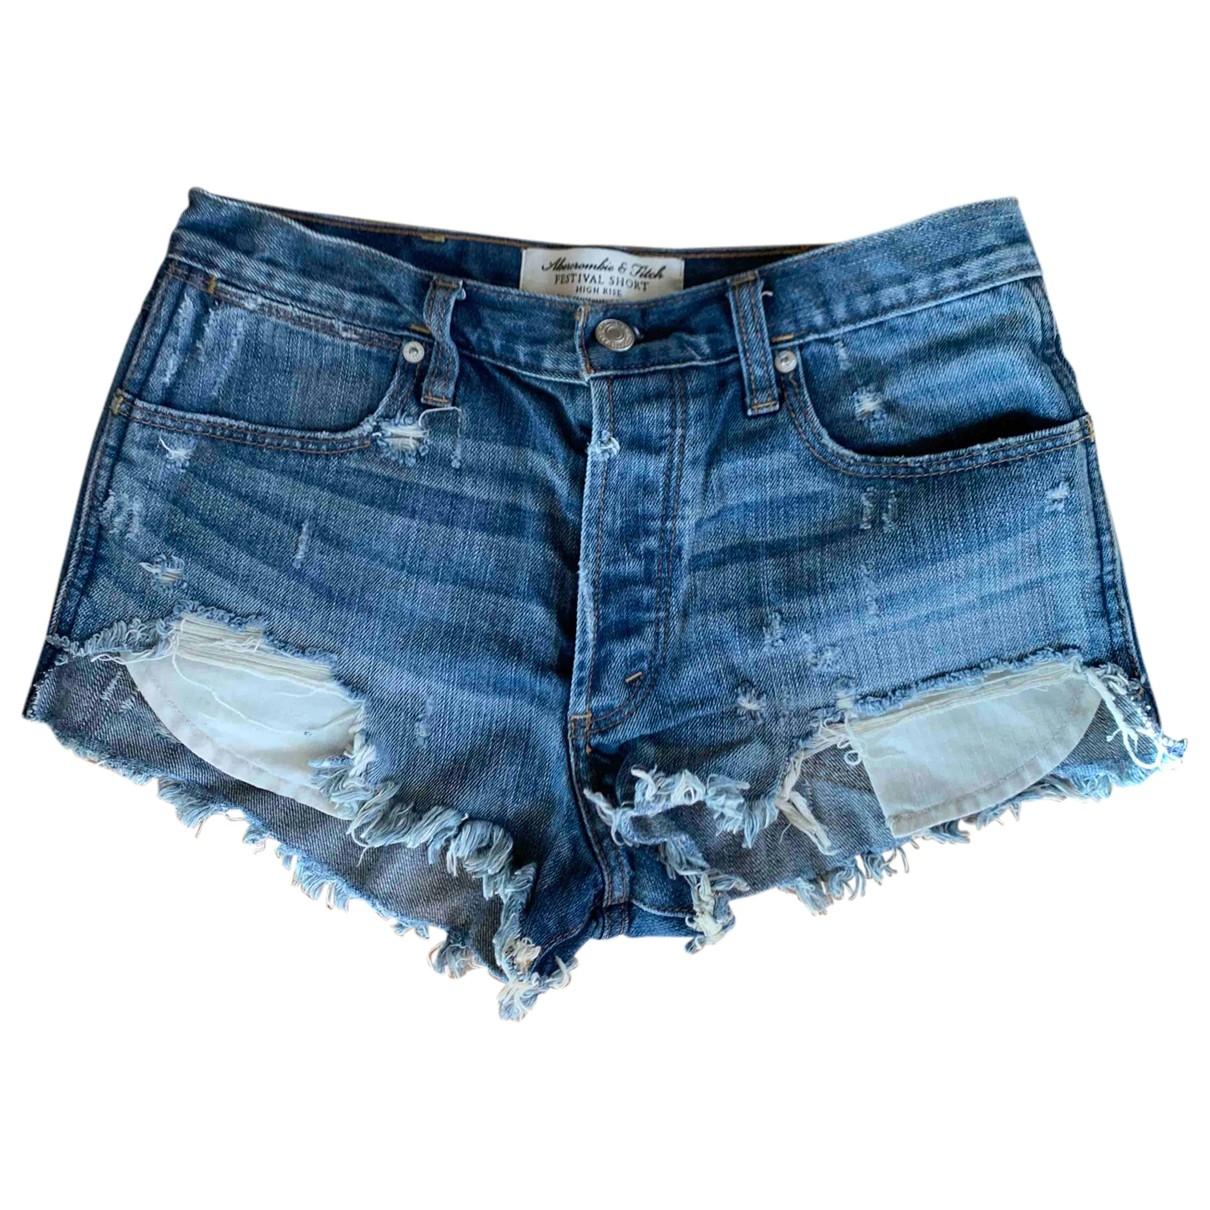 Abercrombie & Fitch \N Shorts in  Blau Denim - Jeans